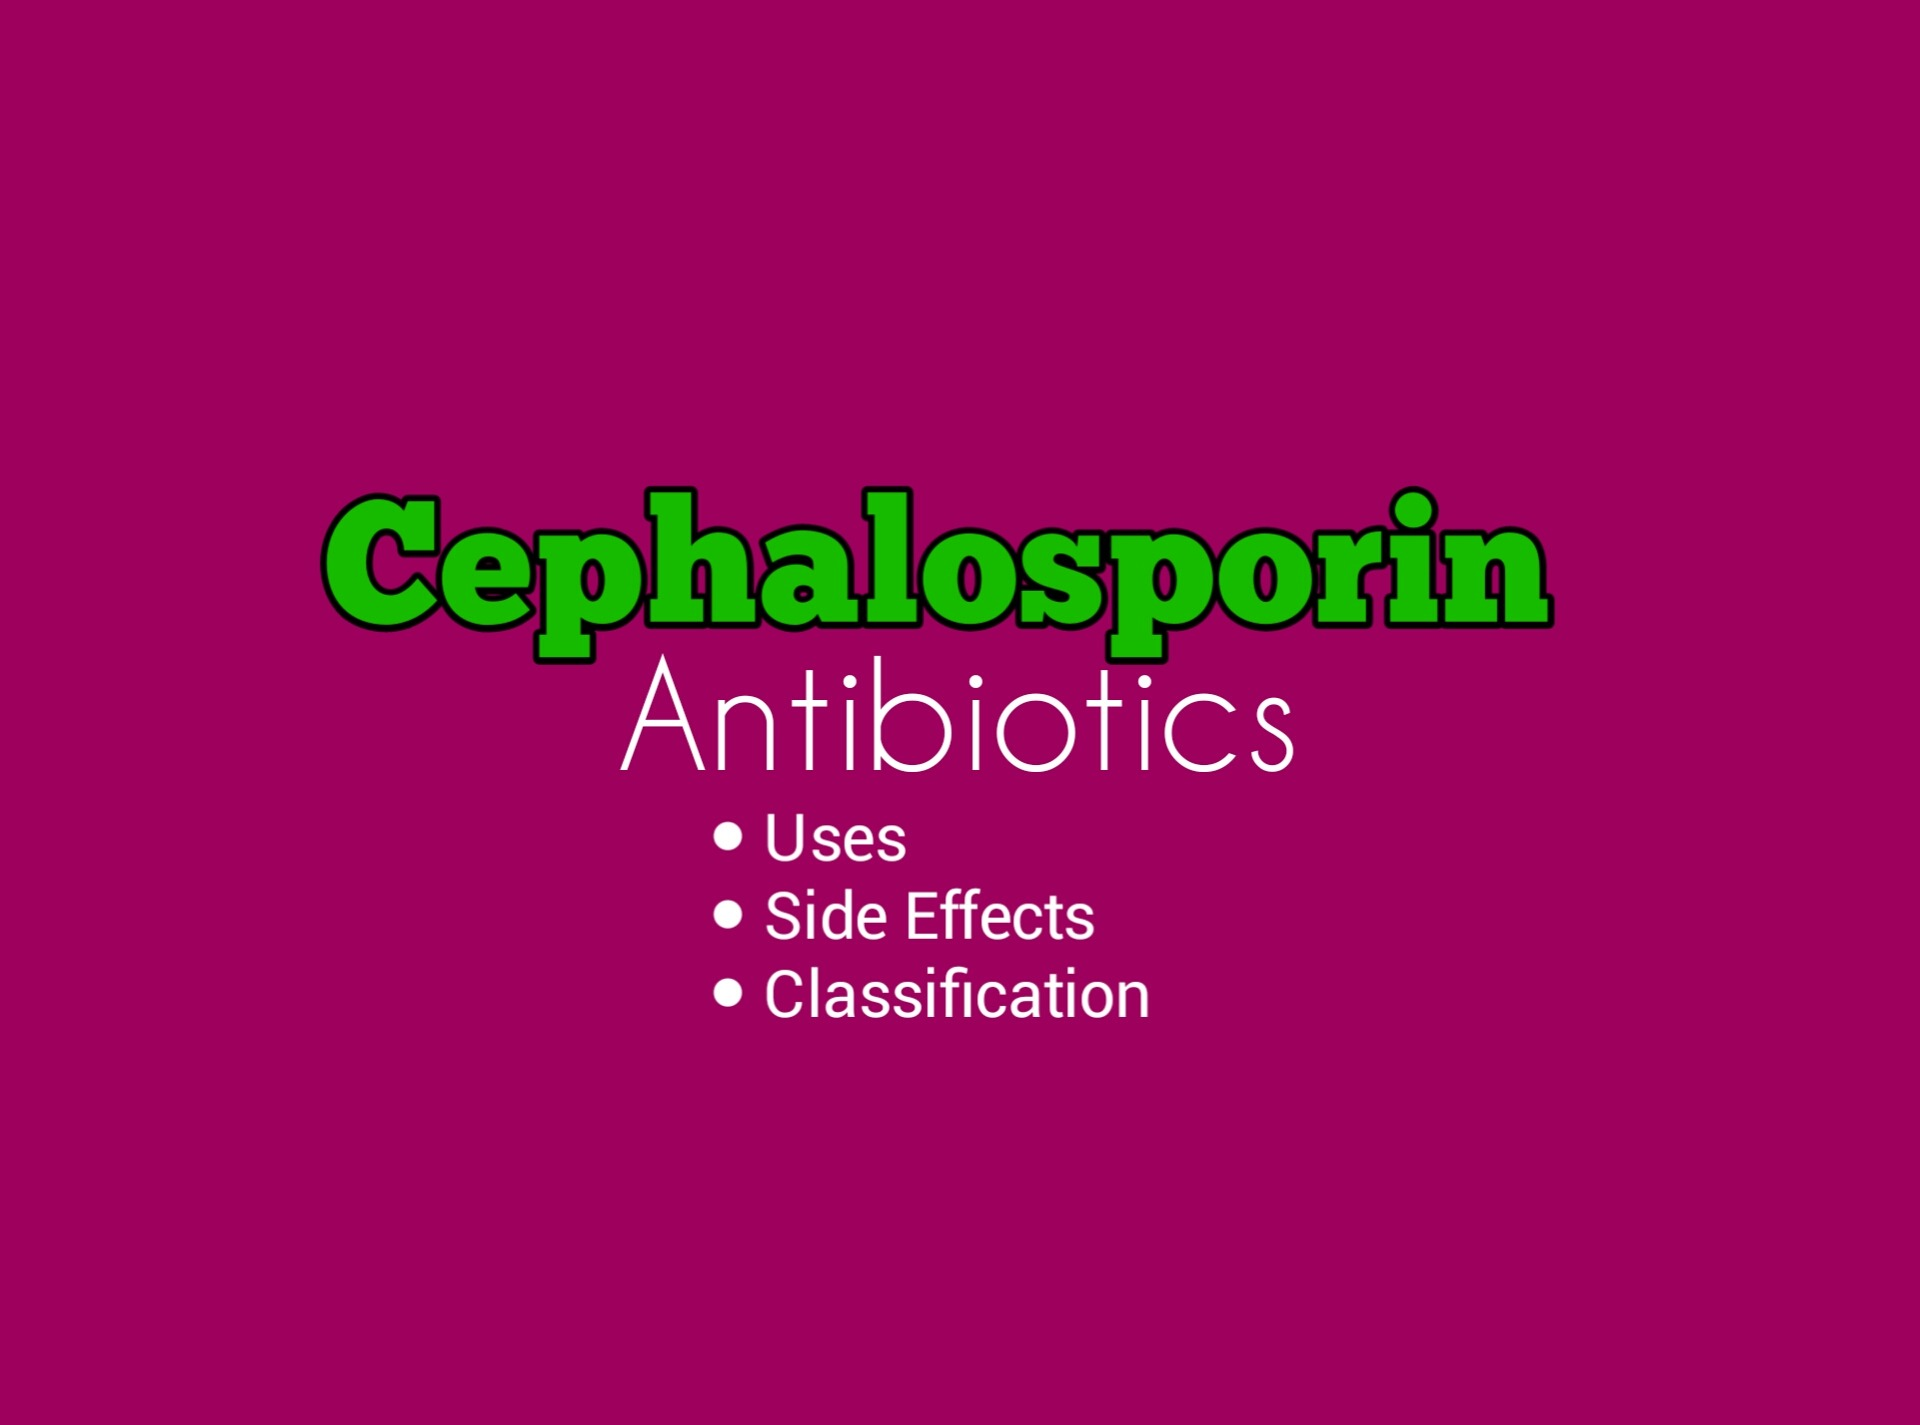 Classification of Cephalosporins Antibiotics – DrugsBank